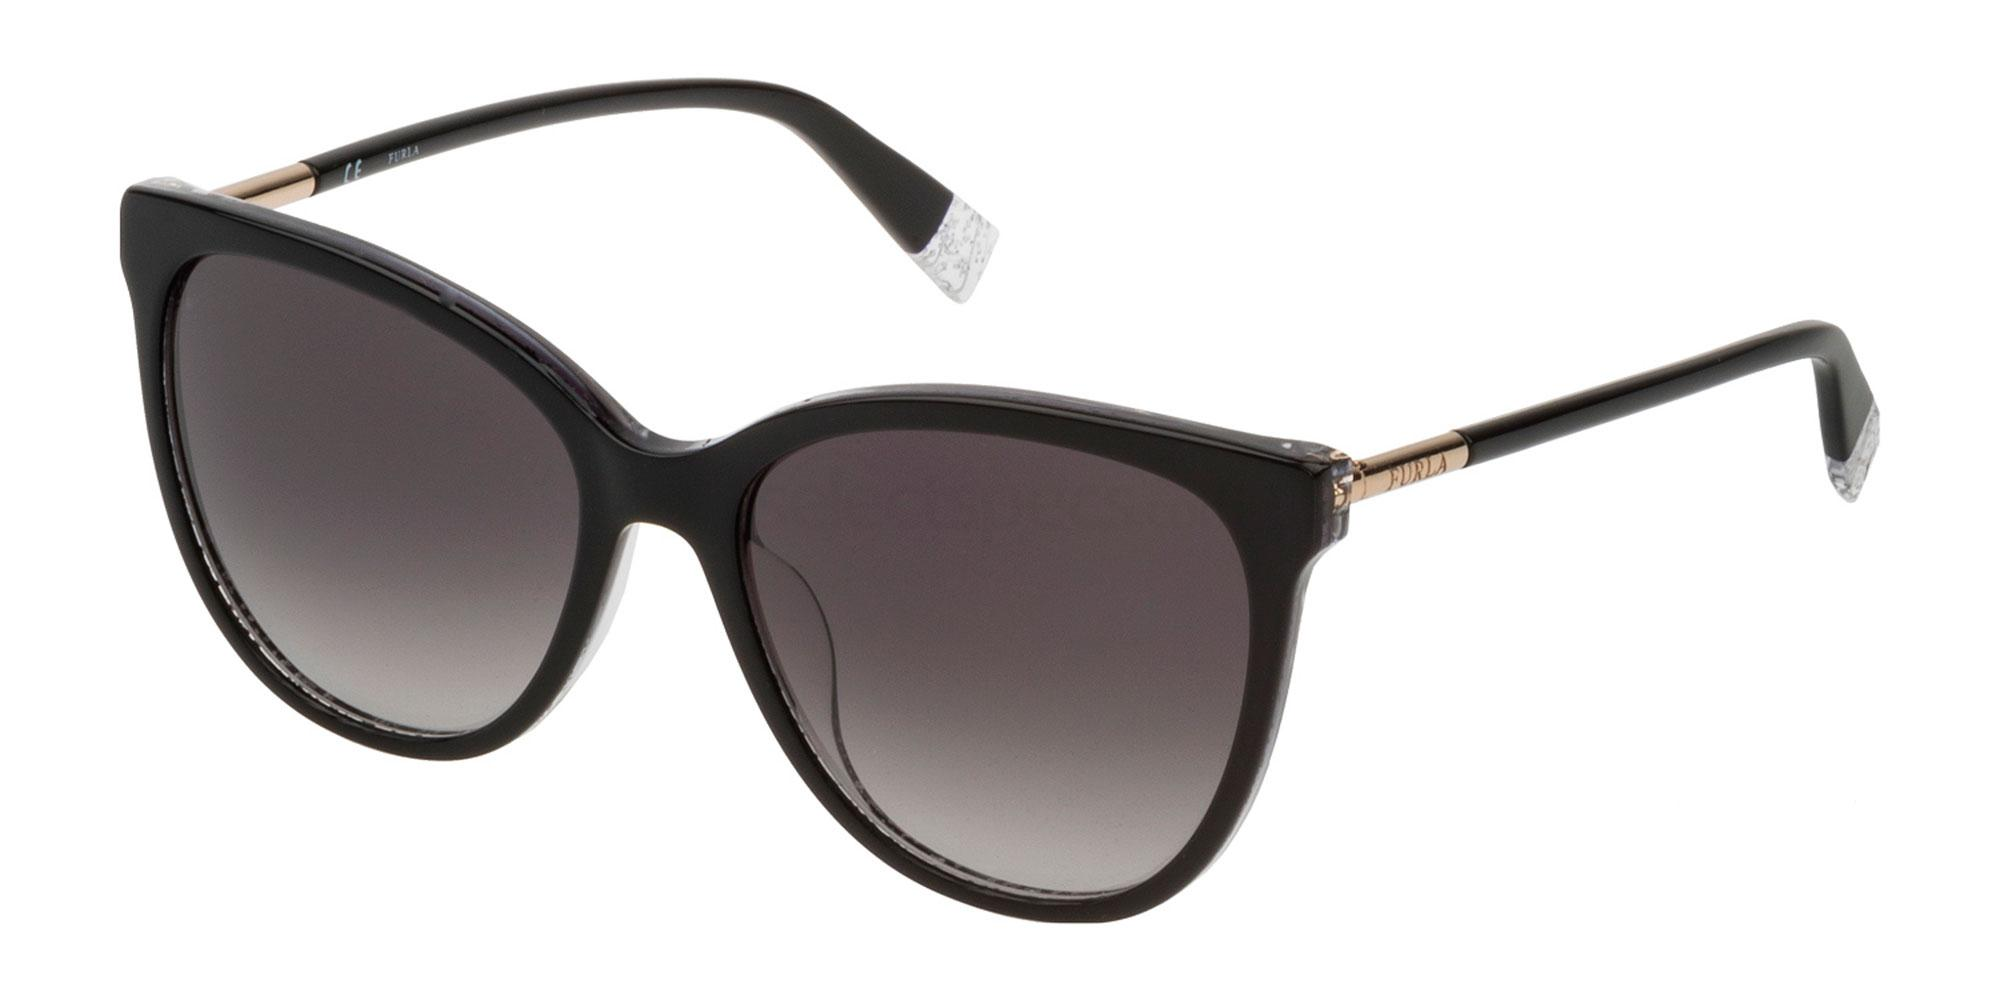 09G5 SFU232 Sunglasses, Furla